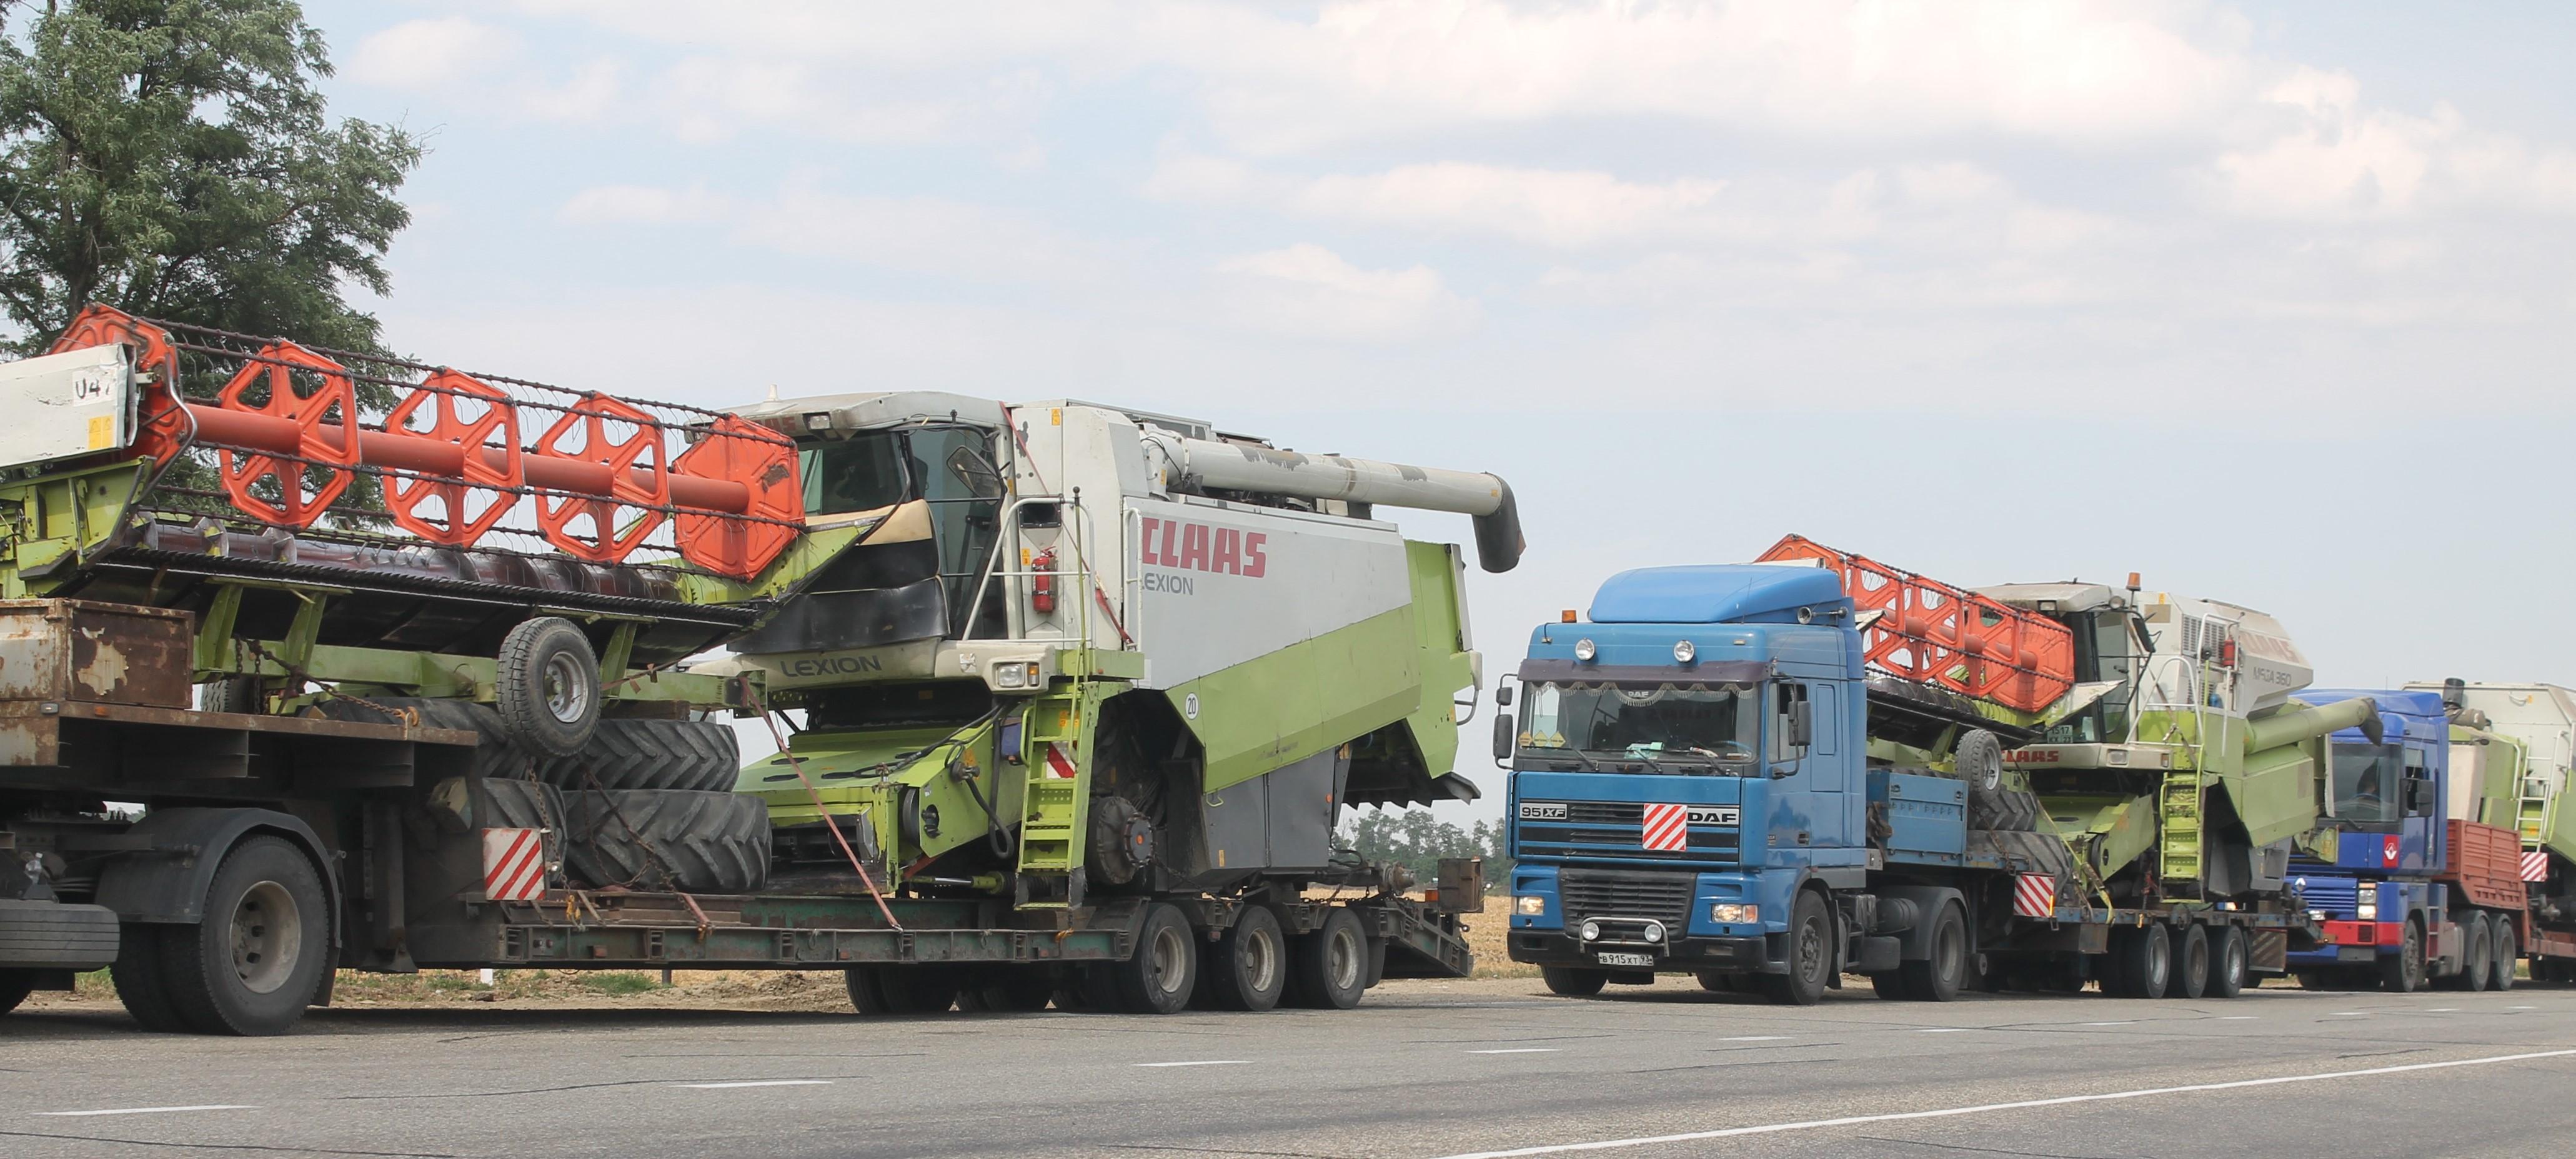 услуги по перевозке комбайнов